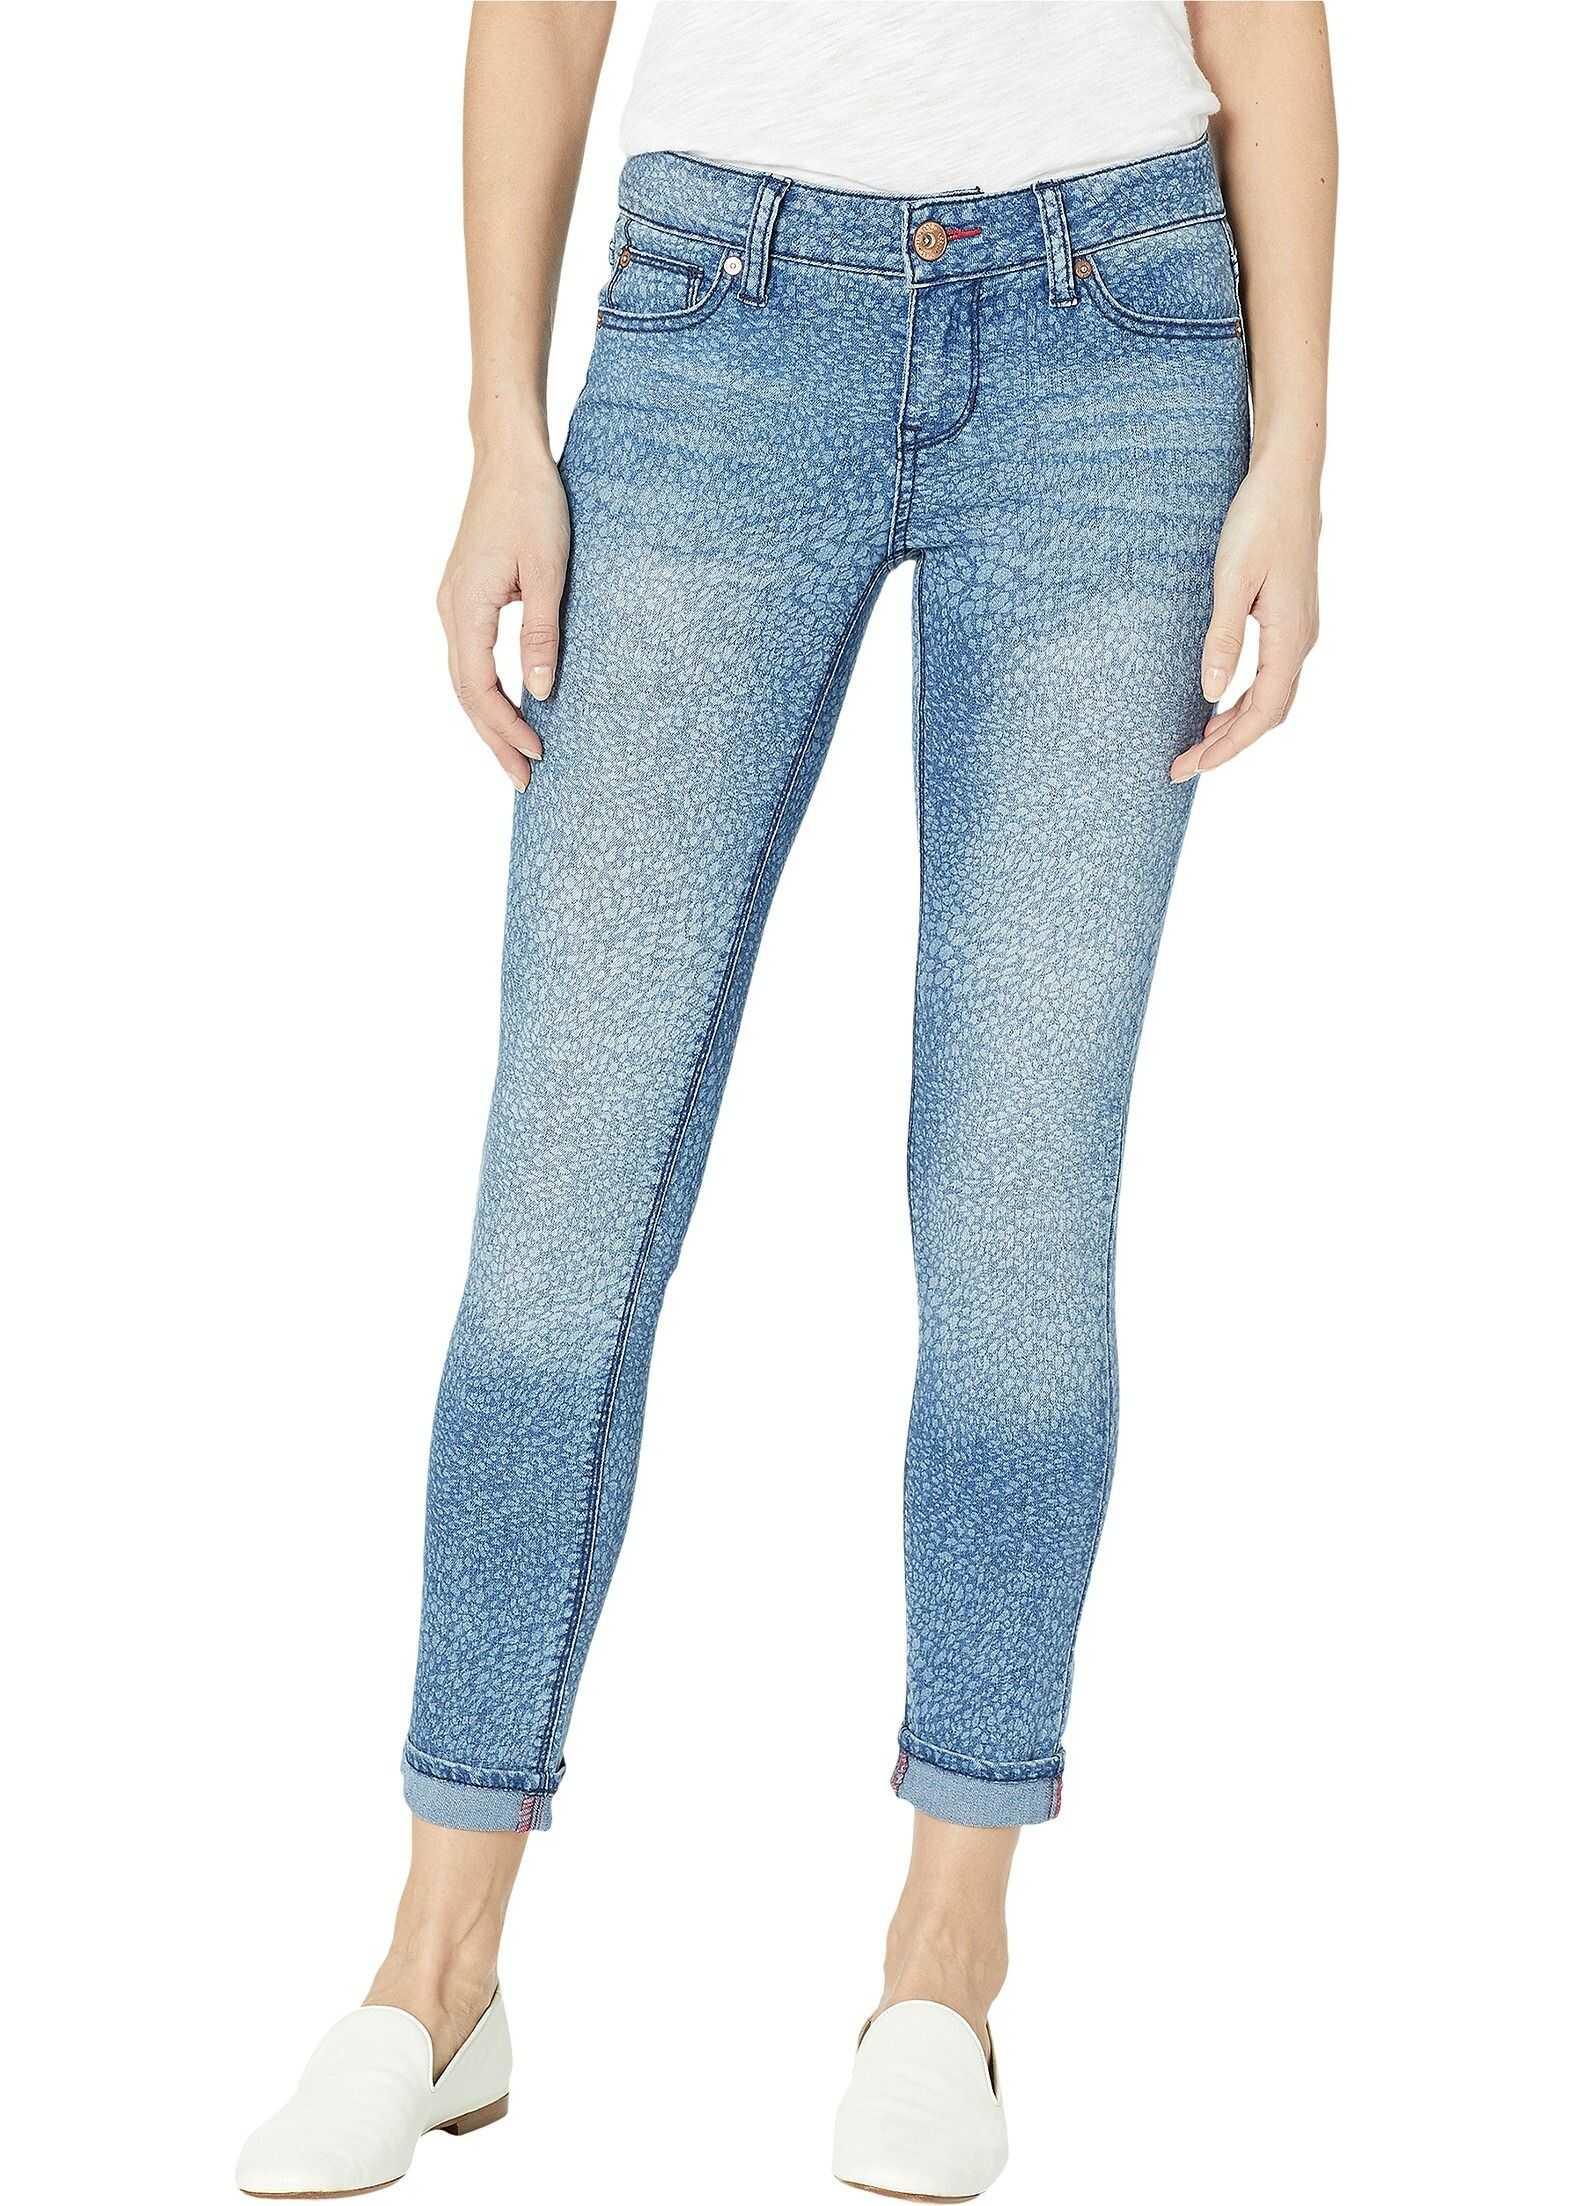 U.S. POLO ASSN. Zoe Skinny Ankle Pants in Blue Print Blue Print